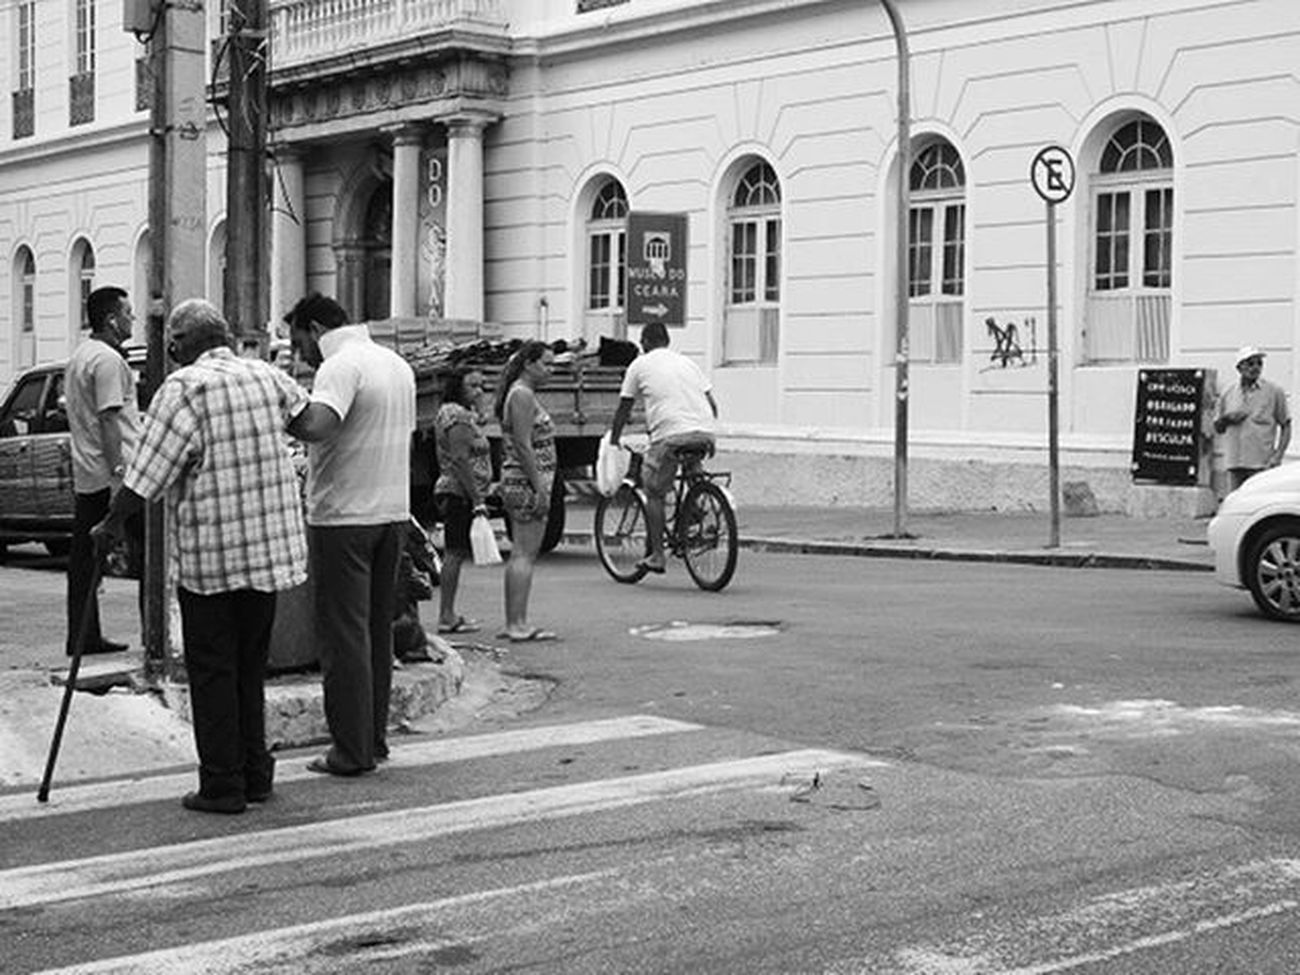 Gentileza gera gentileza. Streetphoto Instagram Instagrambrasil Achadosdasemana Fortaleza Urban Urbanphoto Urbanphotography Loosemag Looseart Blackandwhite Fotomissao Brstreet Brstreet0316 Amigersbr Dnfotografia